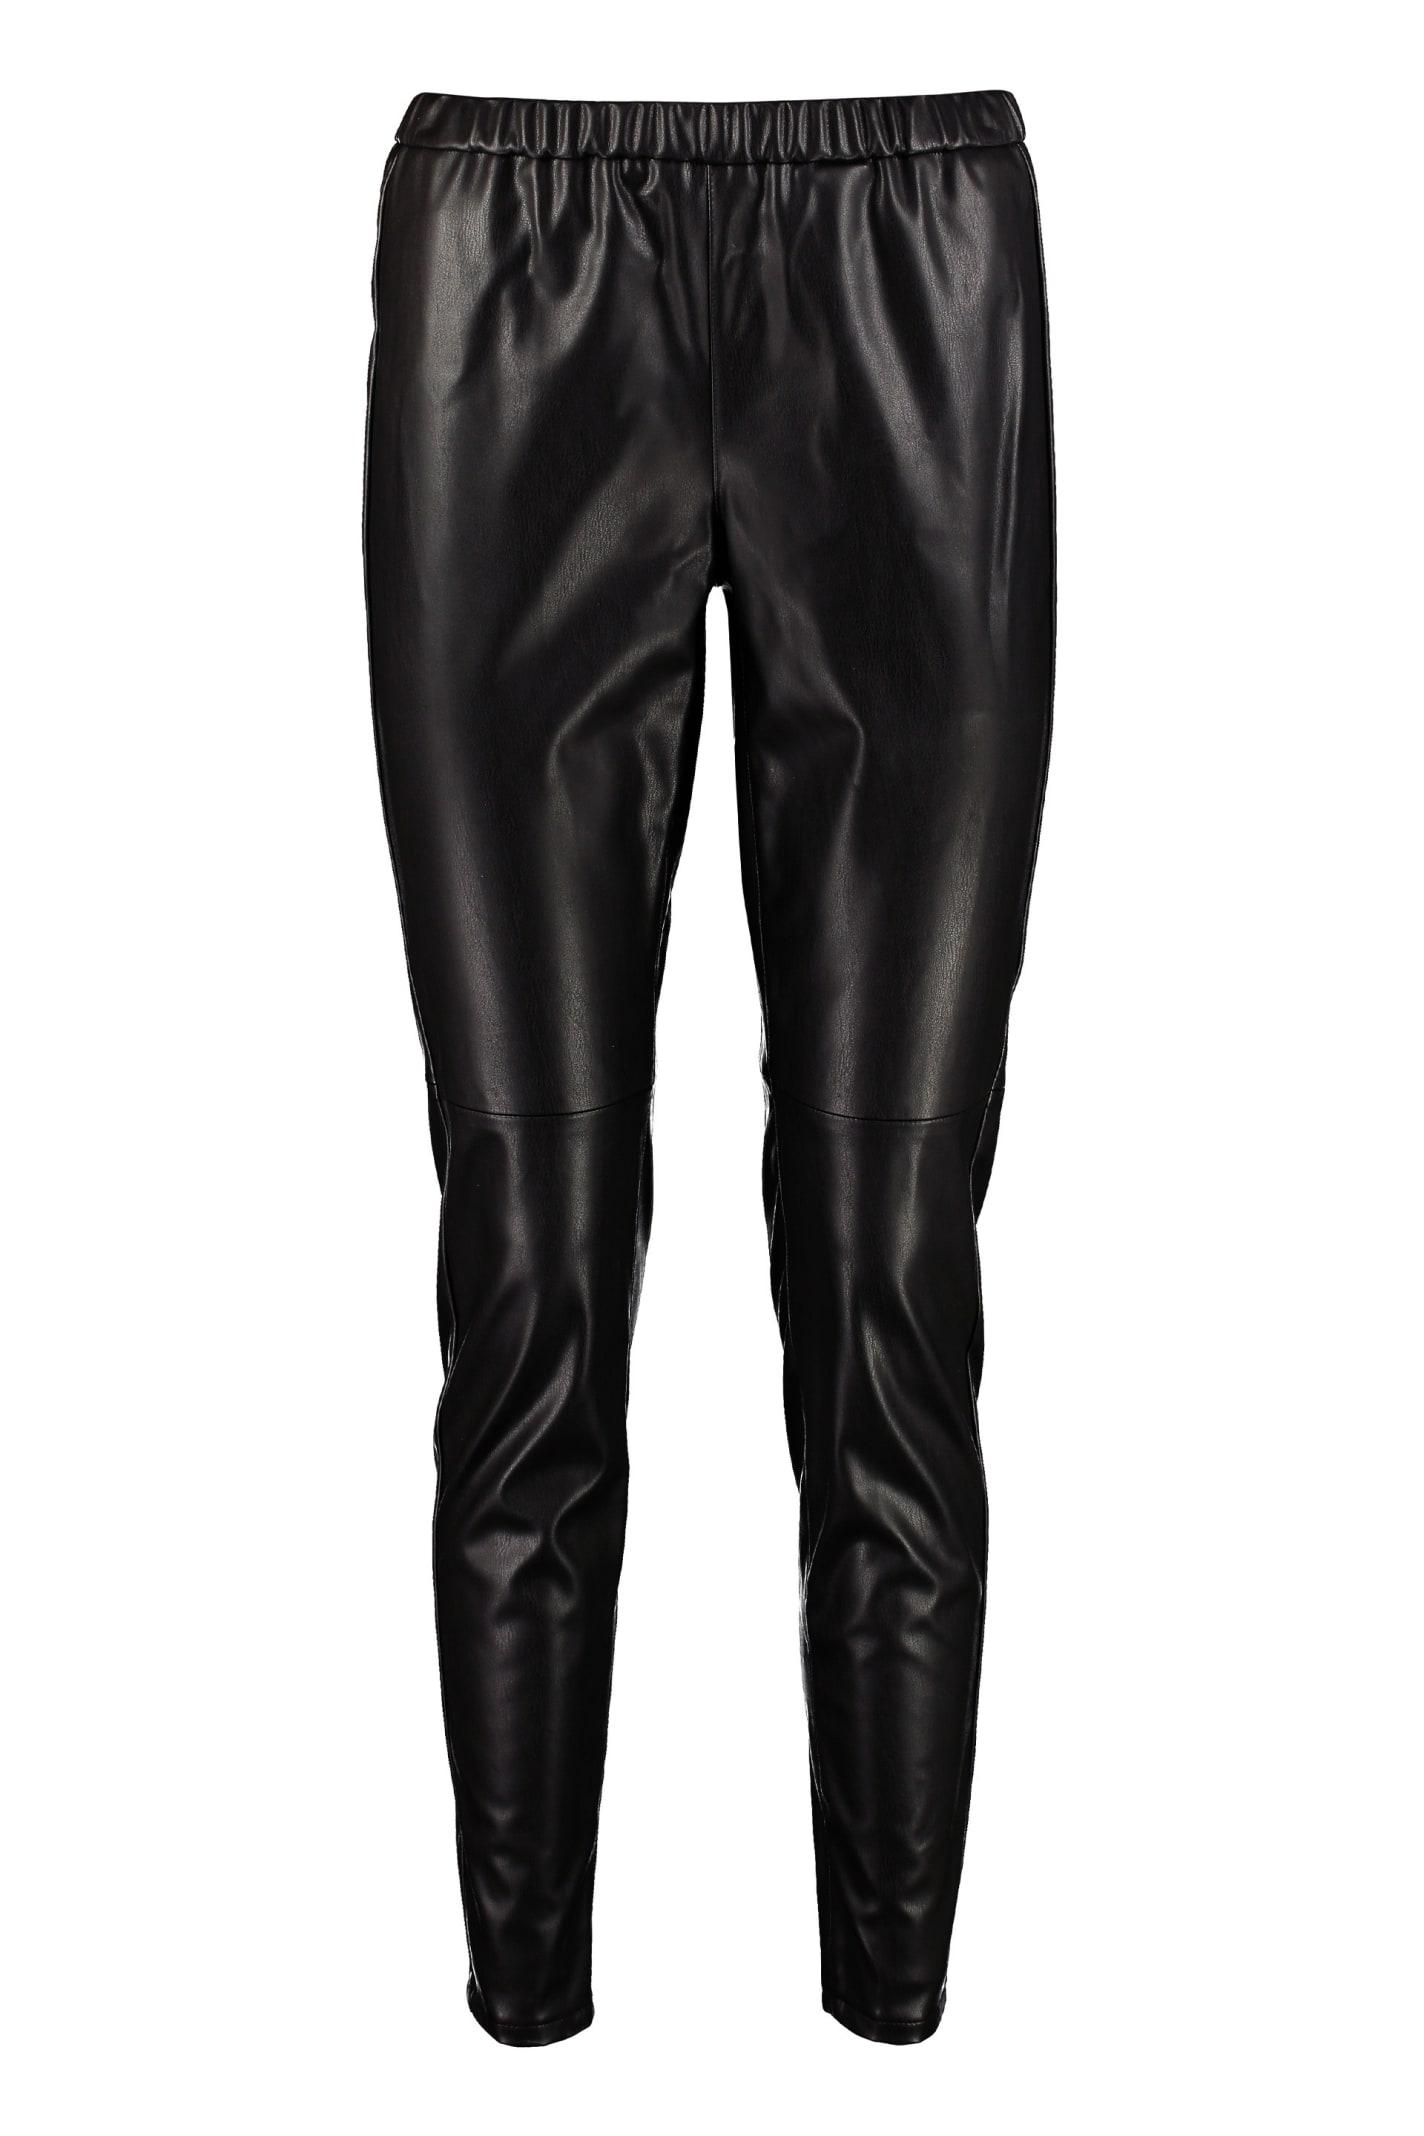 Michael Michael Kors Faux Leather Leggings In Black